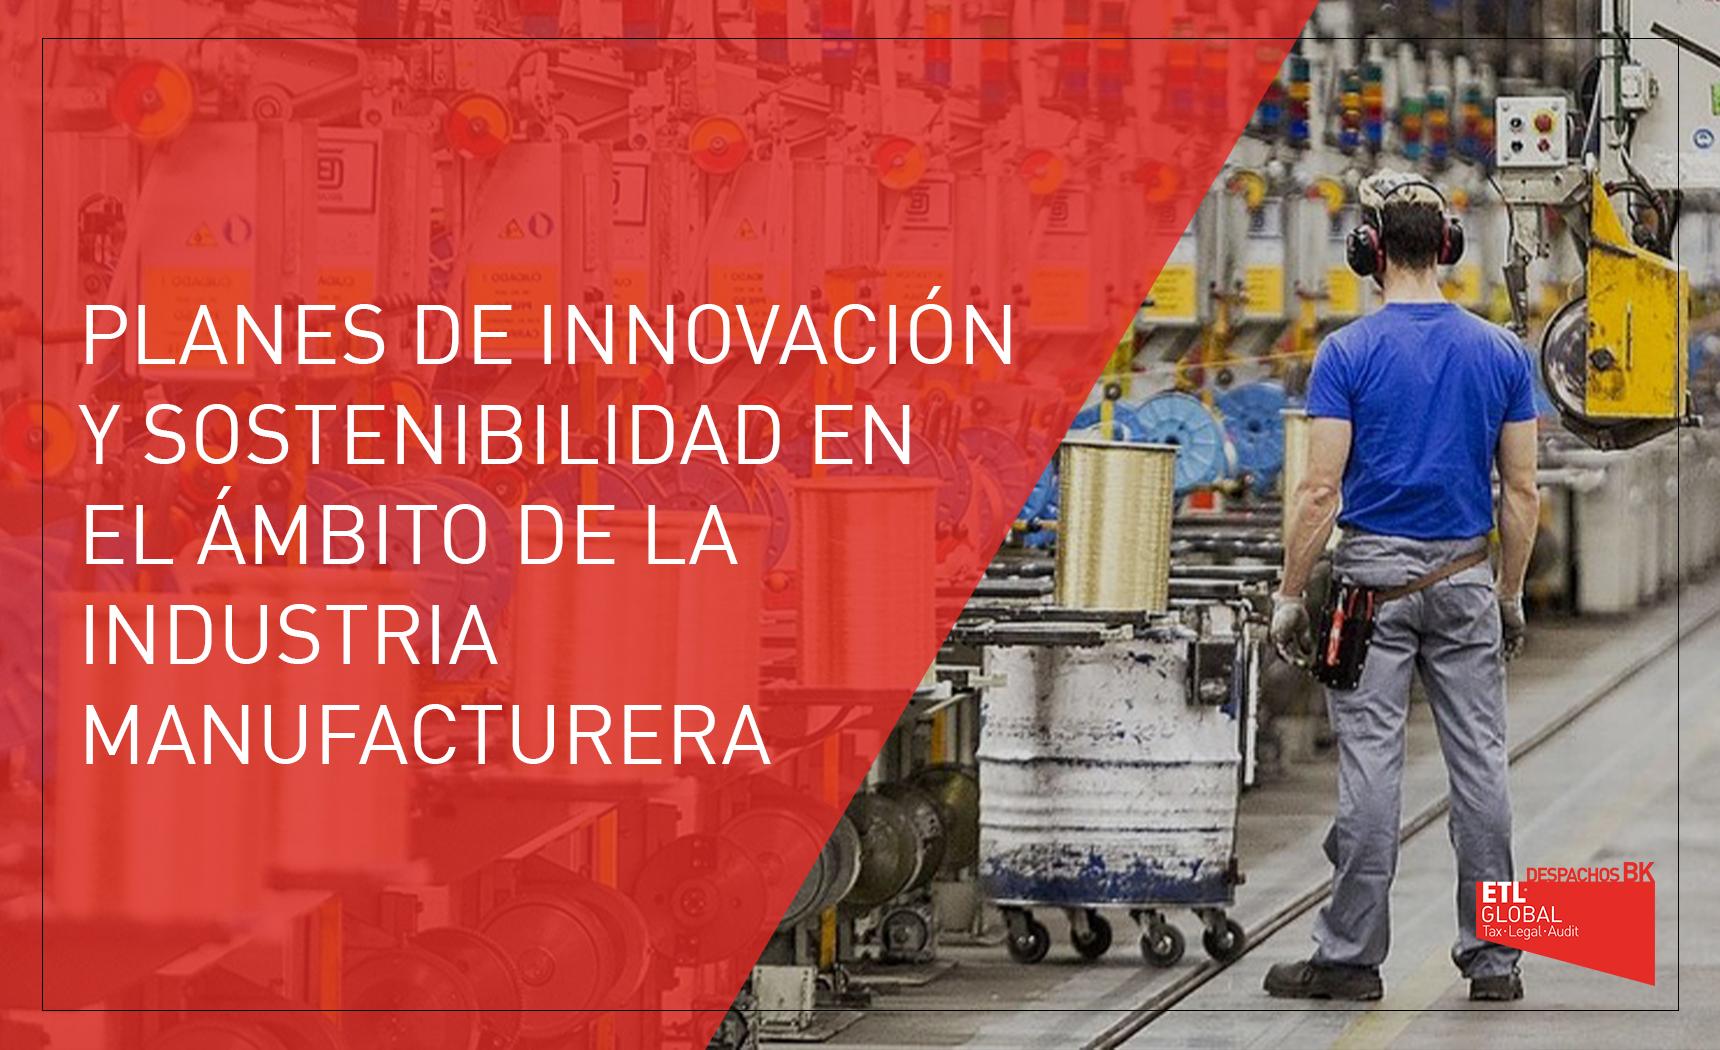 ayudas industria manufacturera 2021